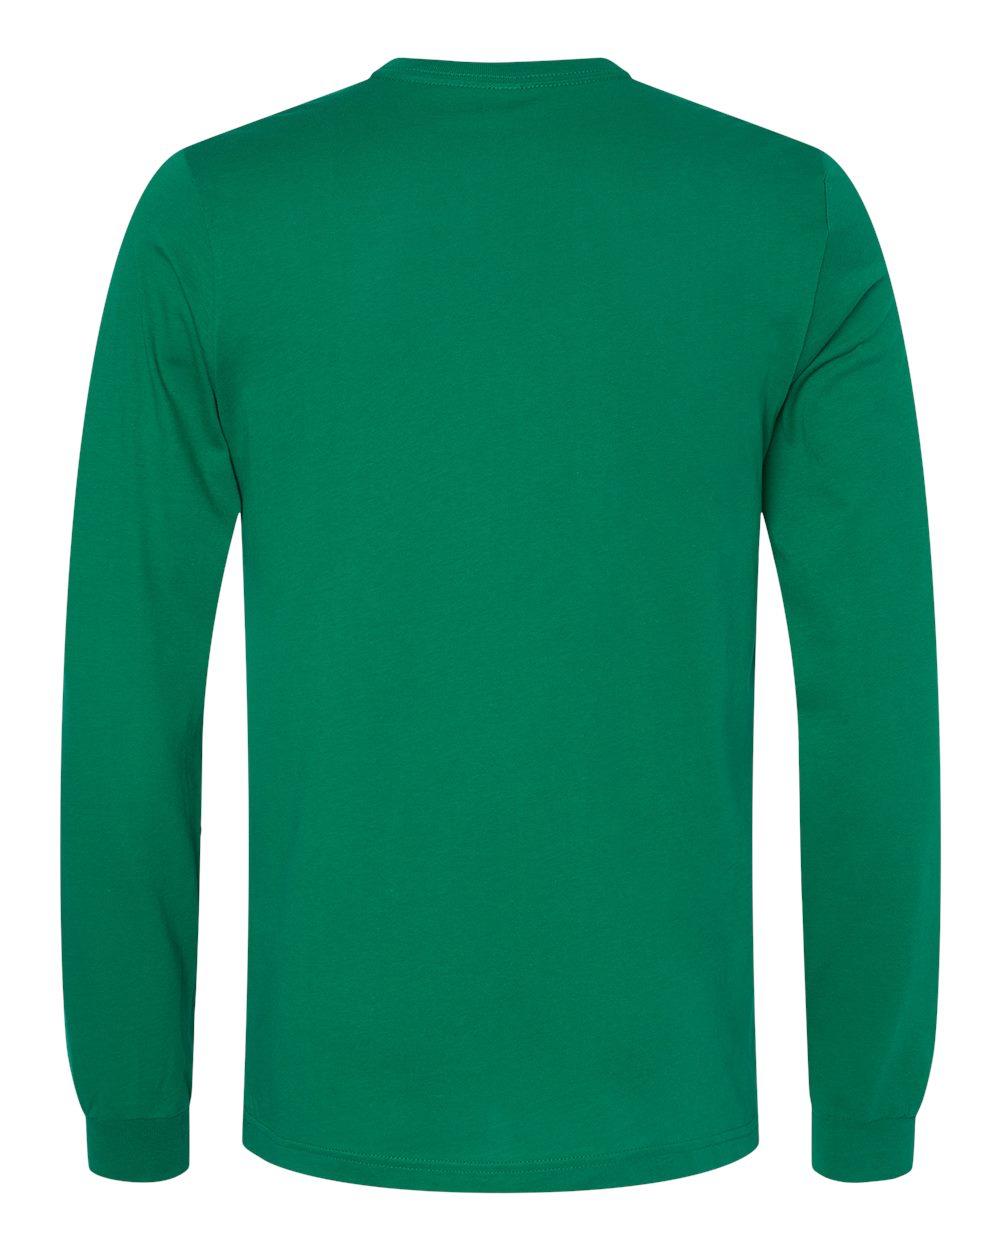 Bella-Canvas-Mens-Blank-Top-Long-Sleeve-Jersey-Tee-T-Shirt-3501-up-to-3XL thumbnail 40